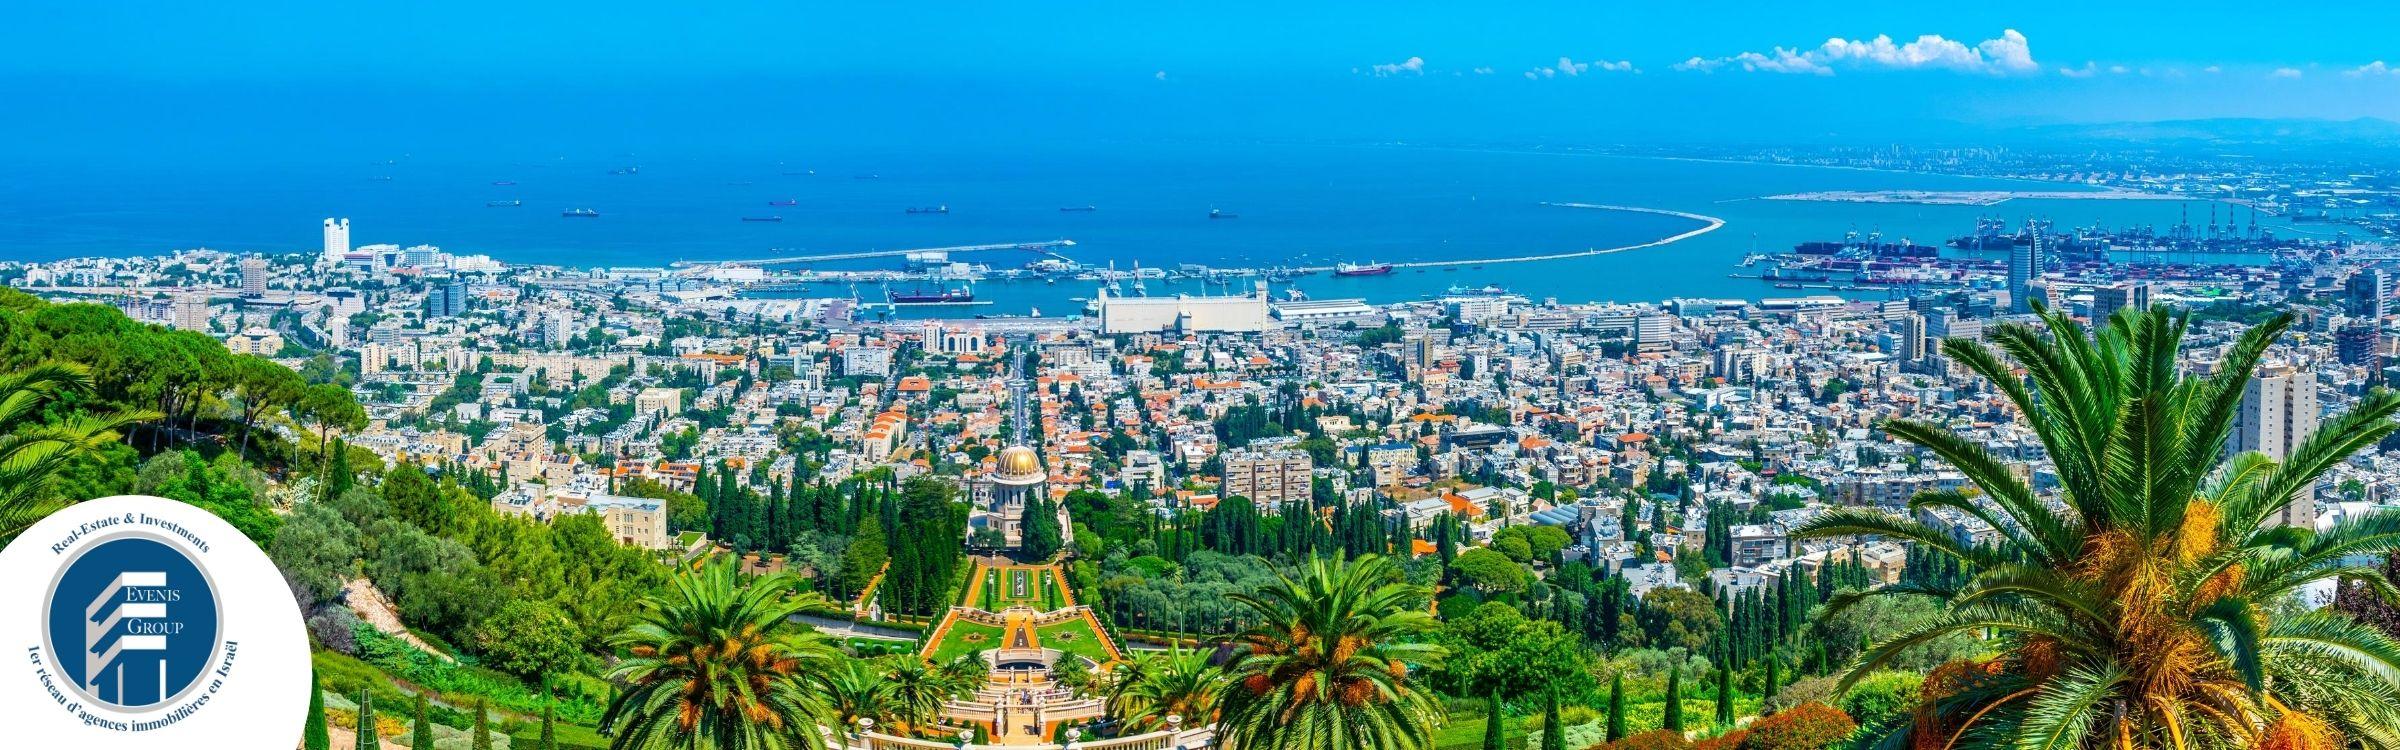 IMMOBILIER A HAIFA EN ISRAEL